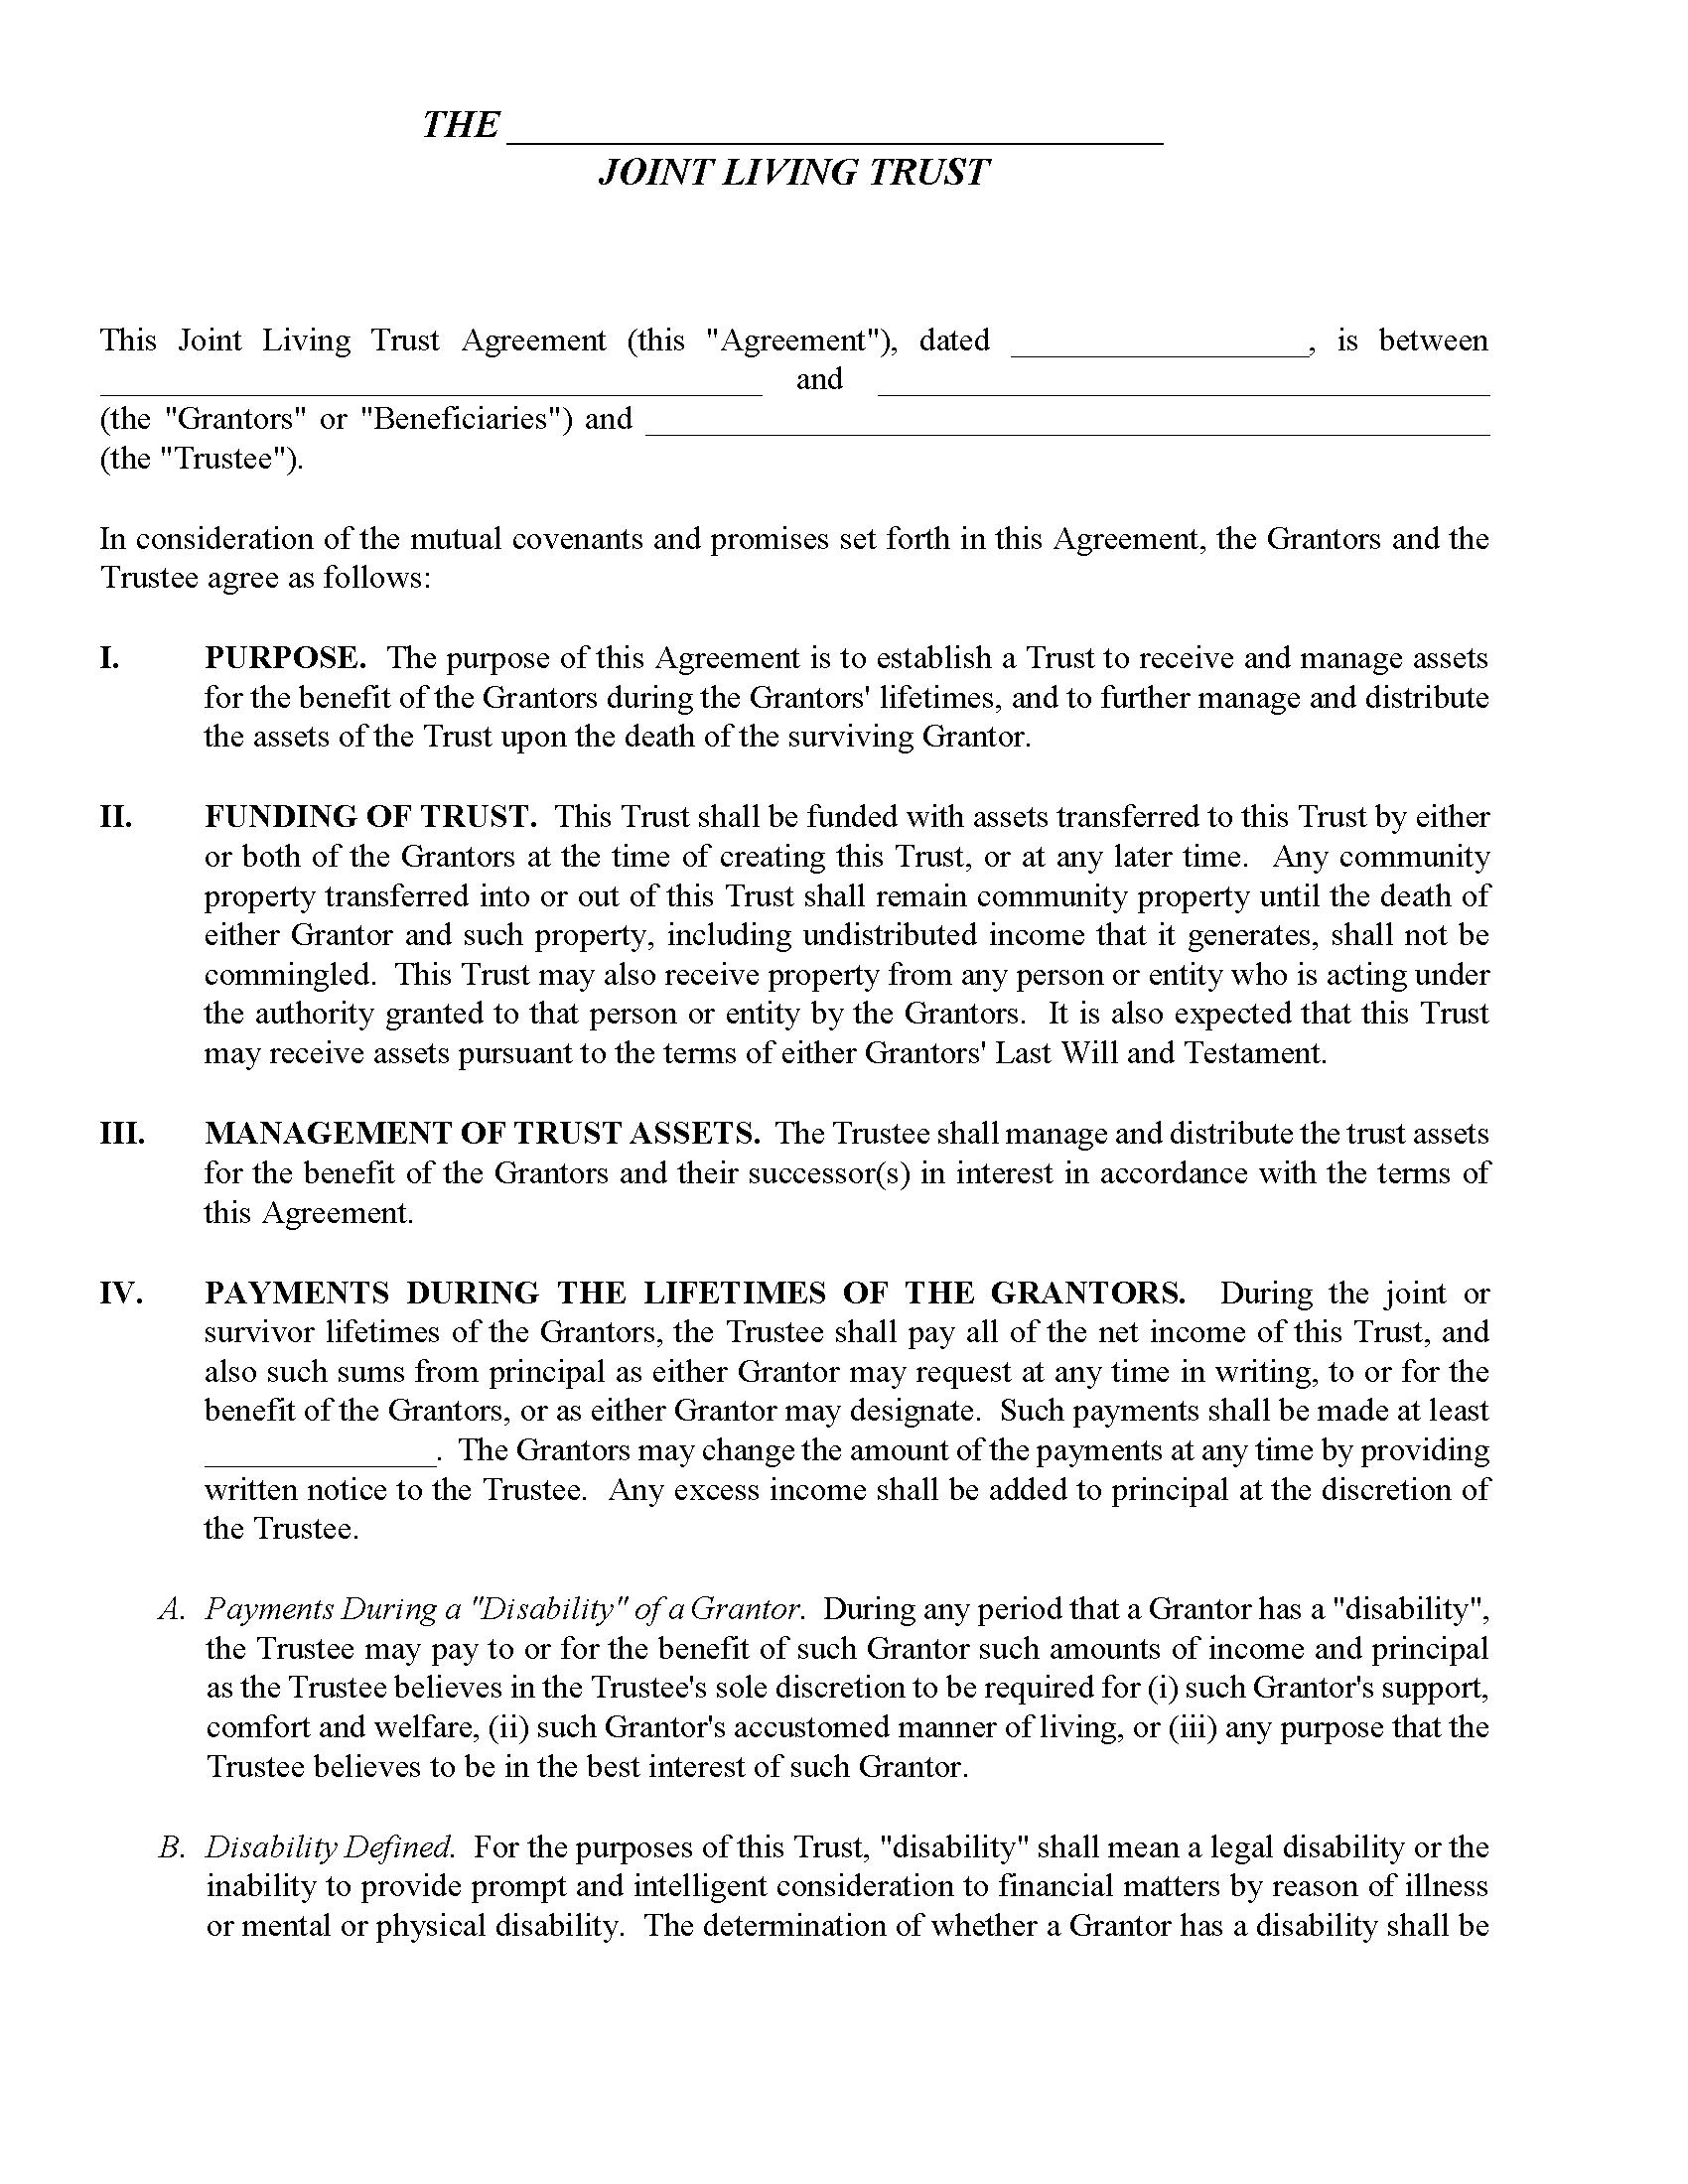 Alabama Joint Living Trust Form